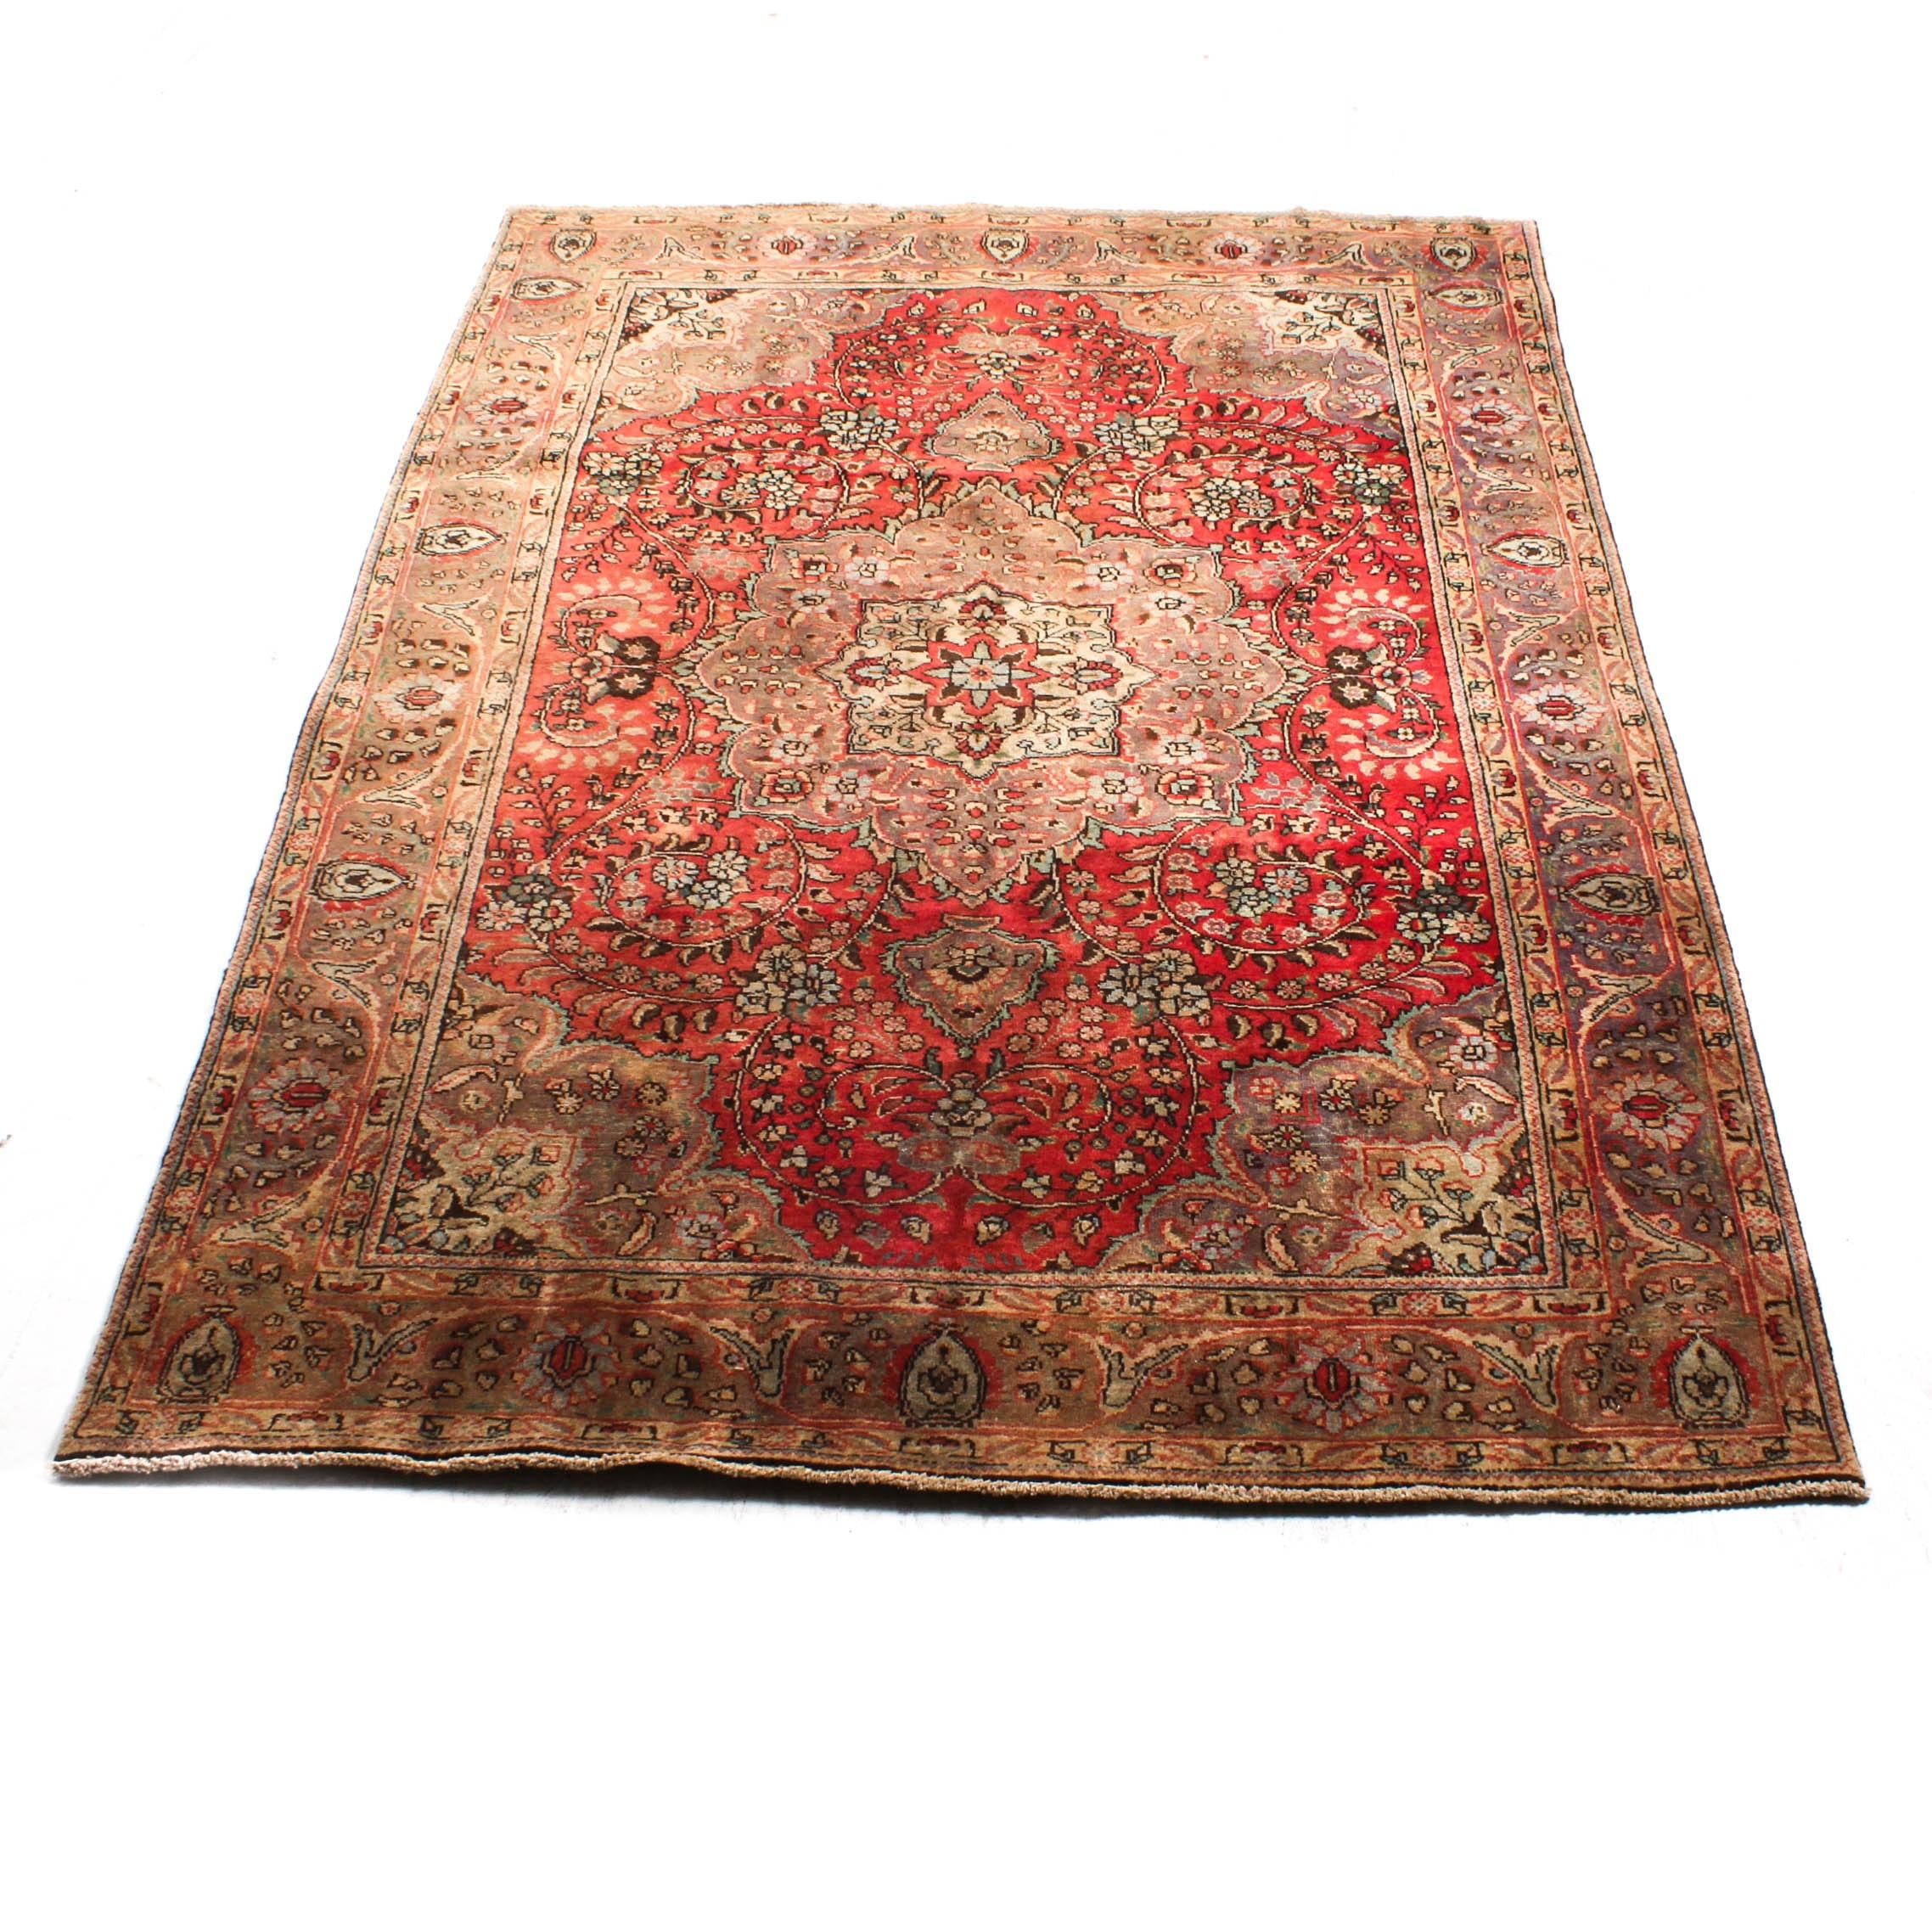 Hand-Knotted Persian Hajalili Tabriz Rug